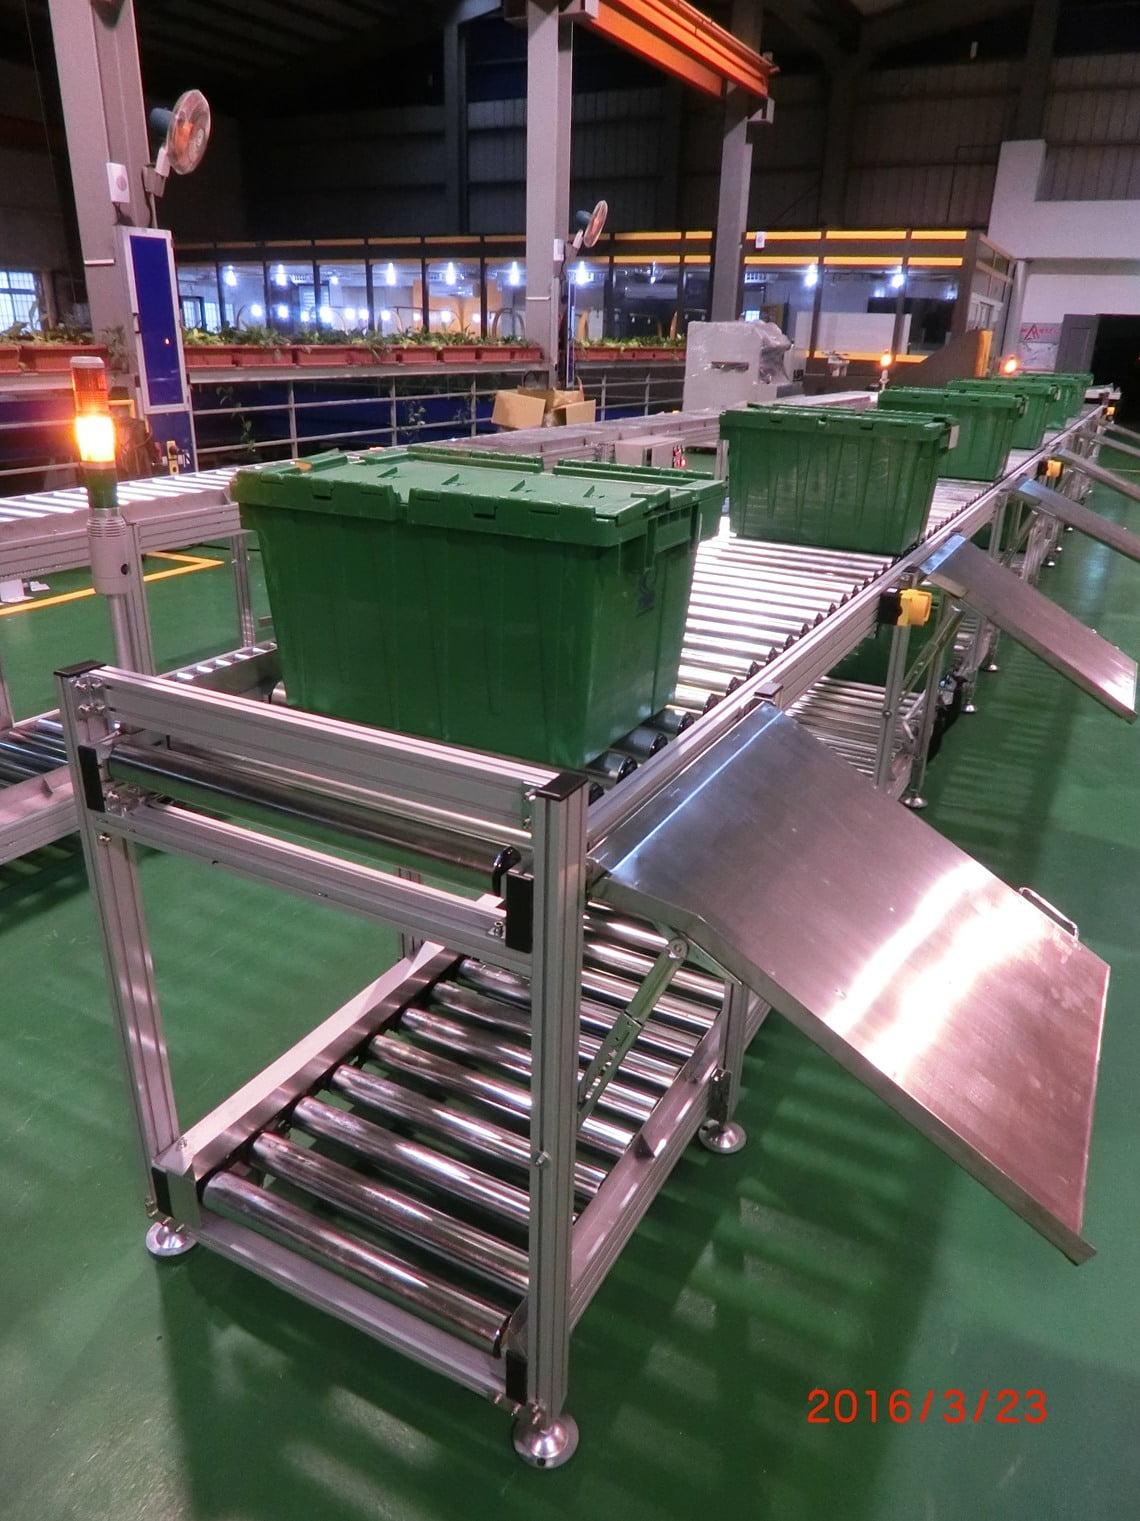 Conveyors, Belt Conveyors, Roller Conveyor, Screw Conveyors, Hopper